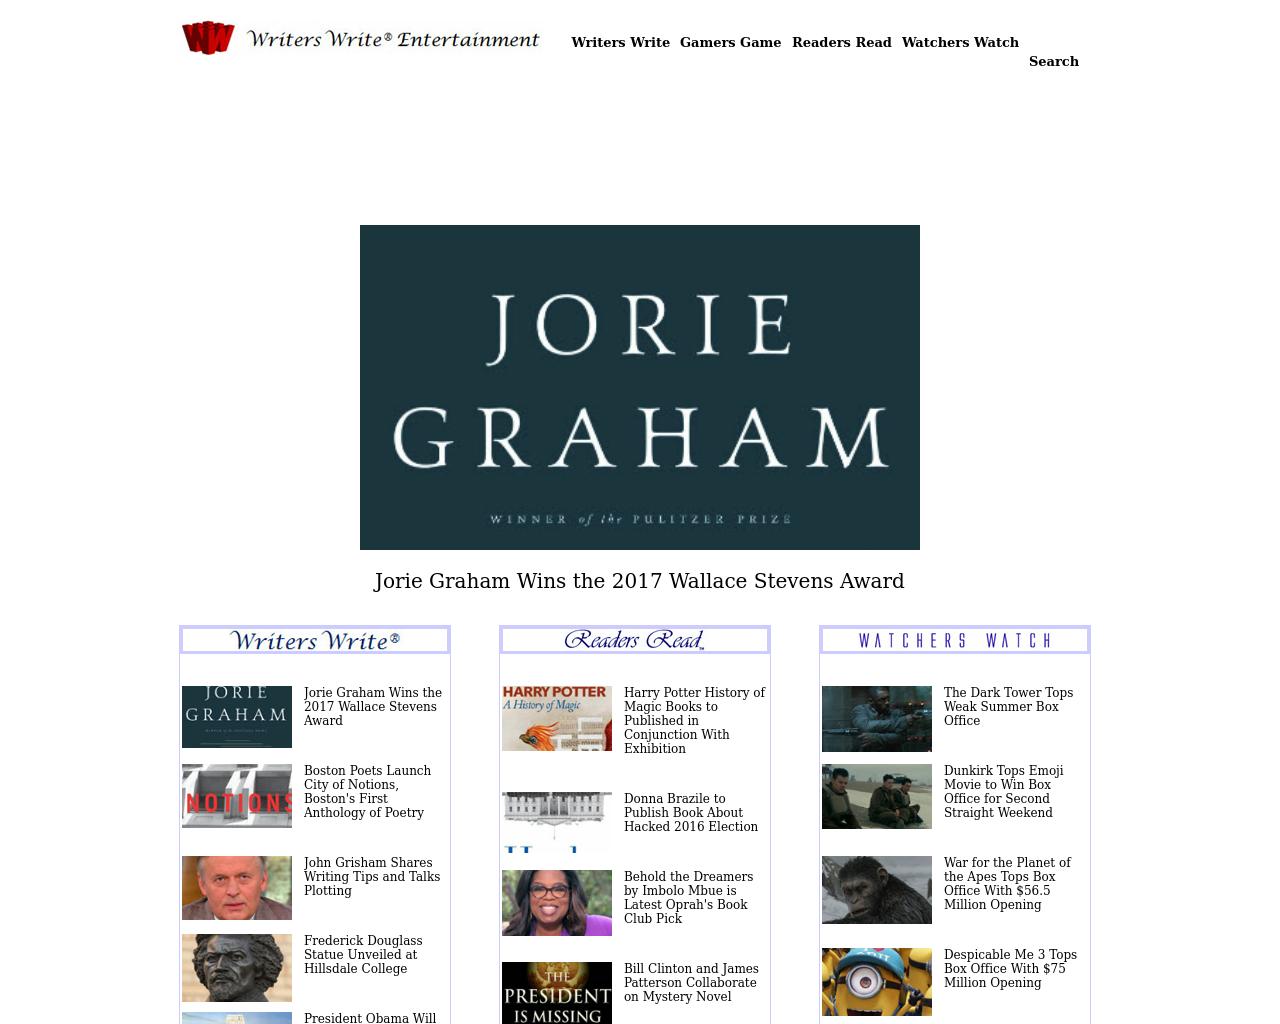 Writers-Write-Advertising-Reviews-Pricing